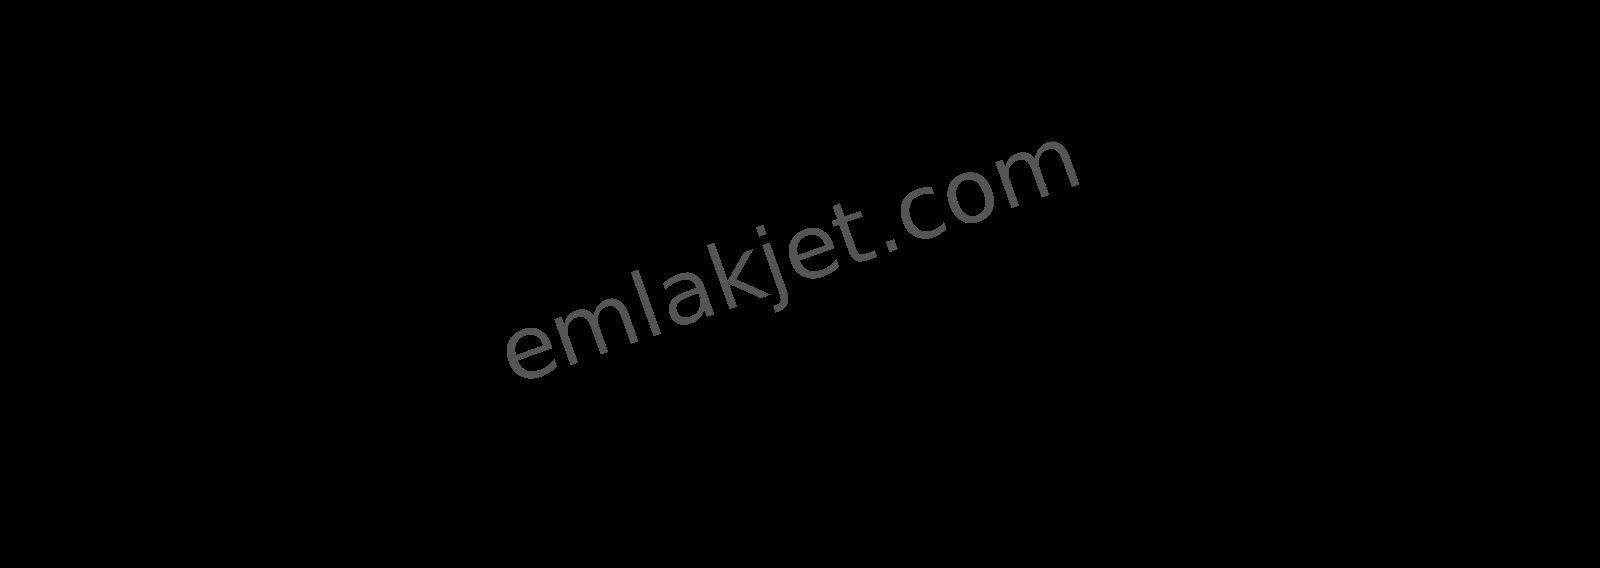 https://imaj.emlakjet.com/listing/9314430/4EEC11C540E8428BCE46F6089622B3169314430.jpg